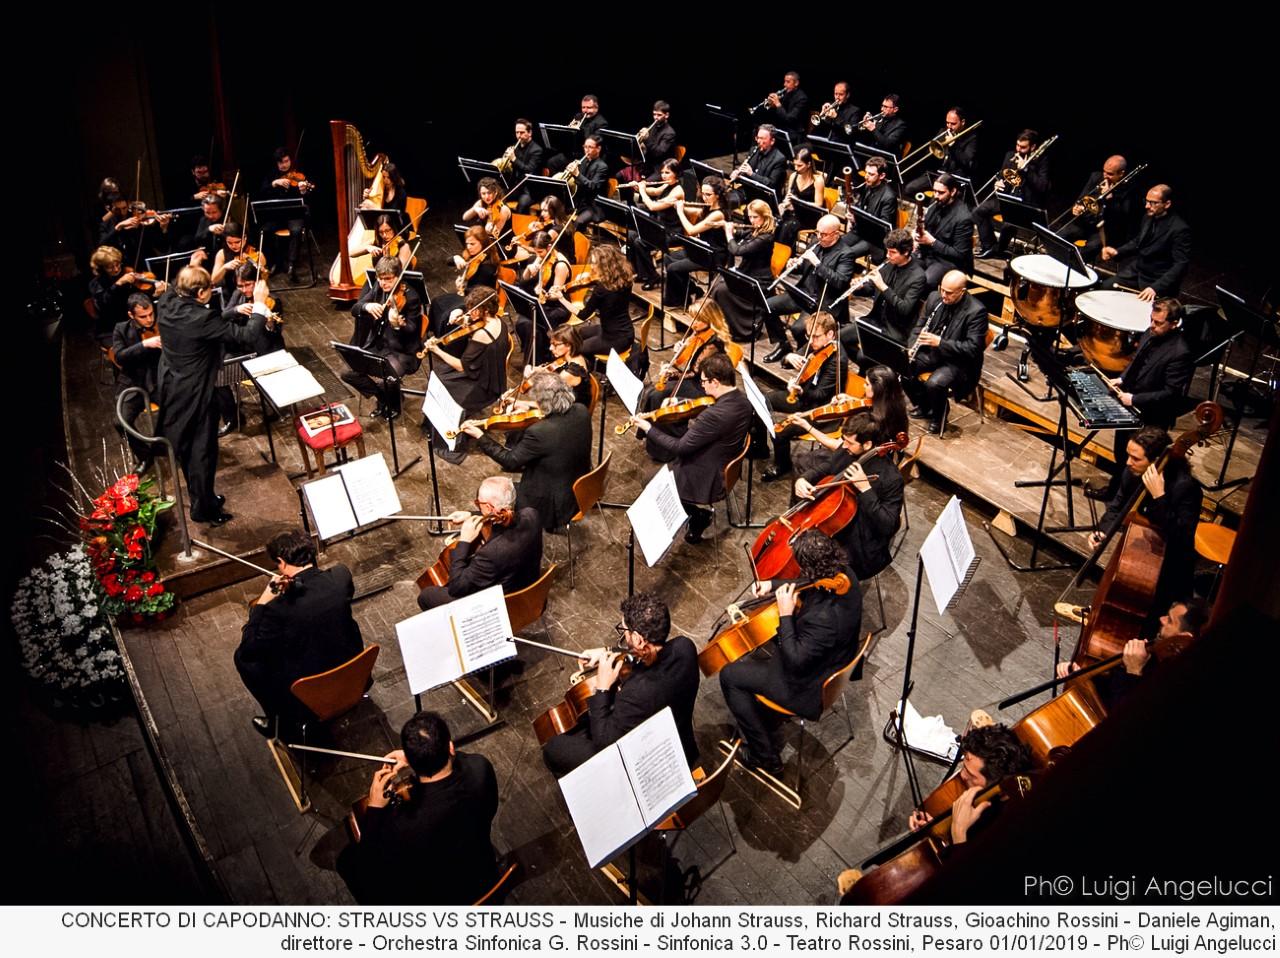 Orchestra Sinfonica Rossini ph. Luigi Angelucci